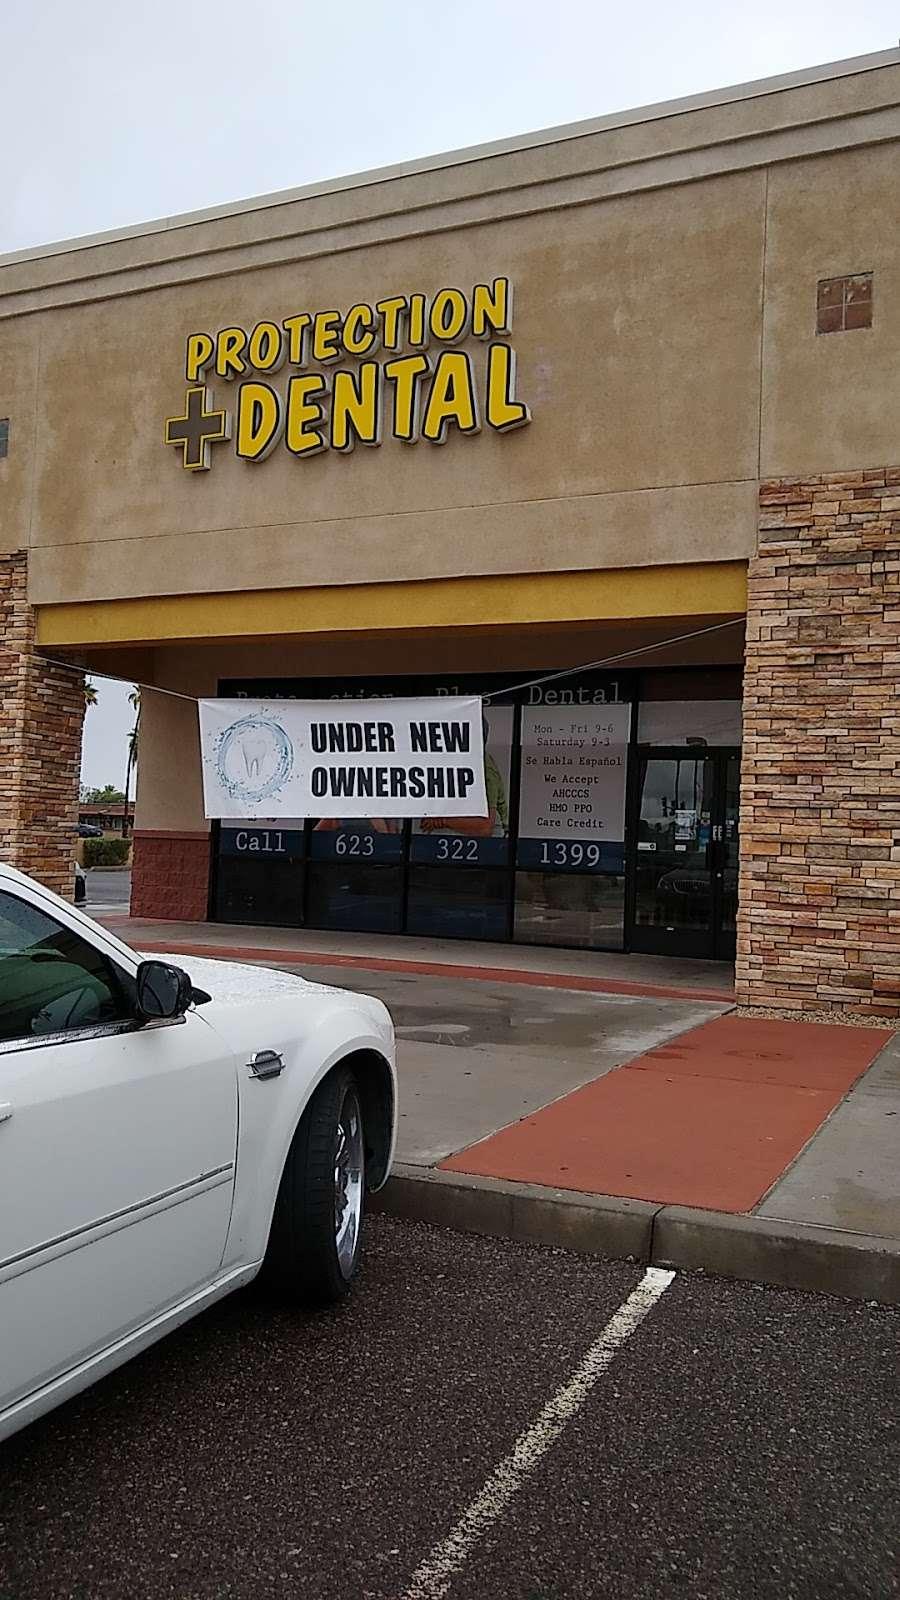 Protection Plus Dental Glendale - dentist  | Photo 7 of 10 | Address: 7025 N 75th Ave #101, Glendale, AZ 85303, USA | Phone: (623) 322-1399